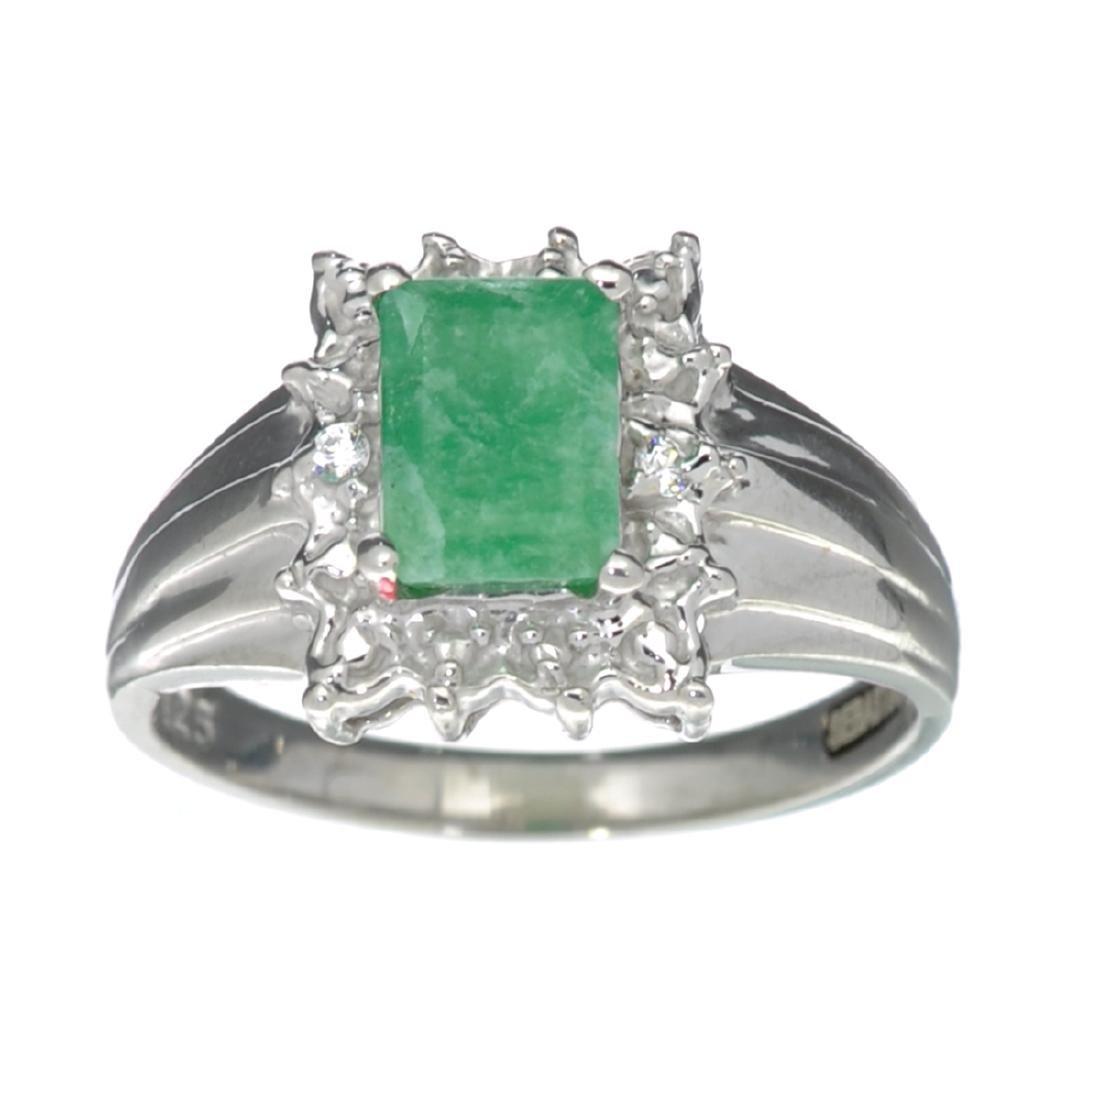 APP: 0.5k Fine Jewelry Designer Sebastian, 0.73CT Green